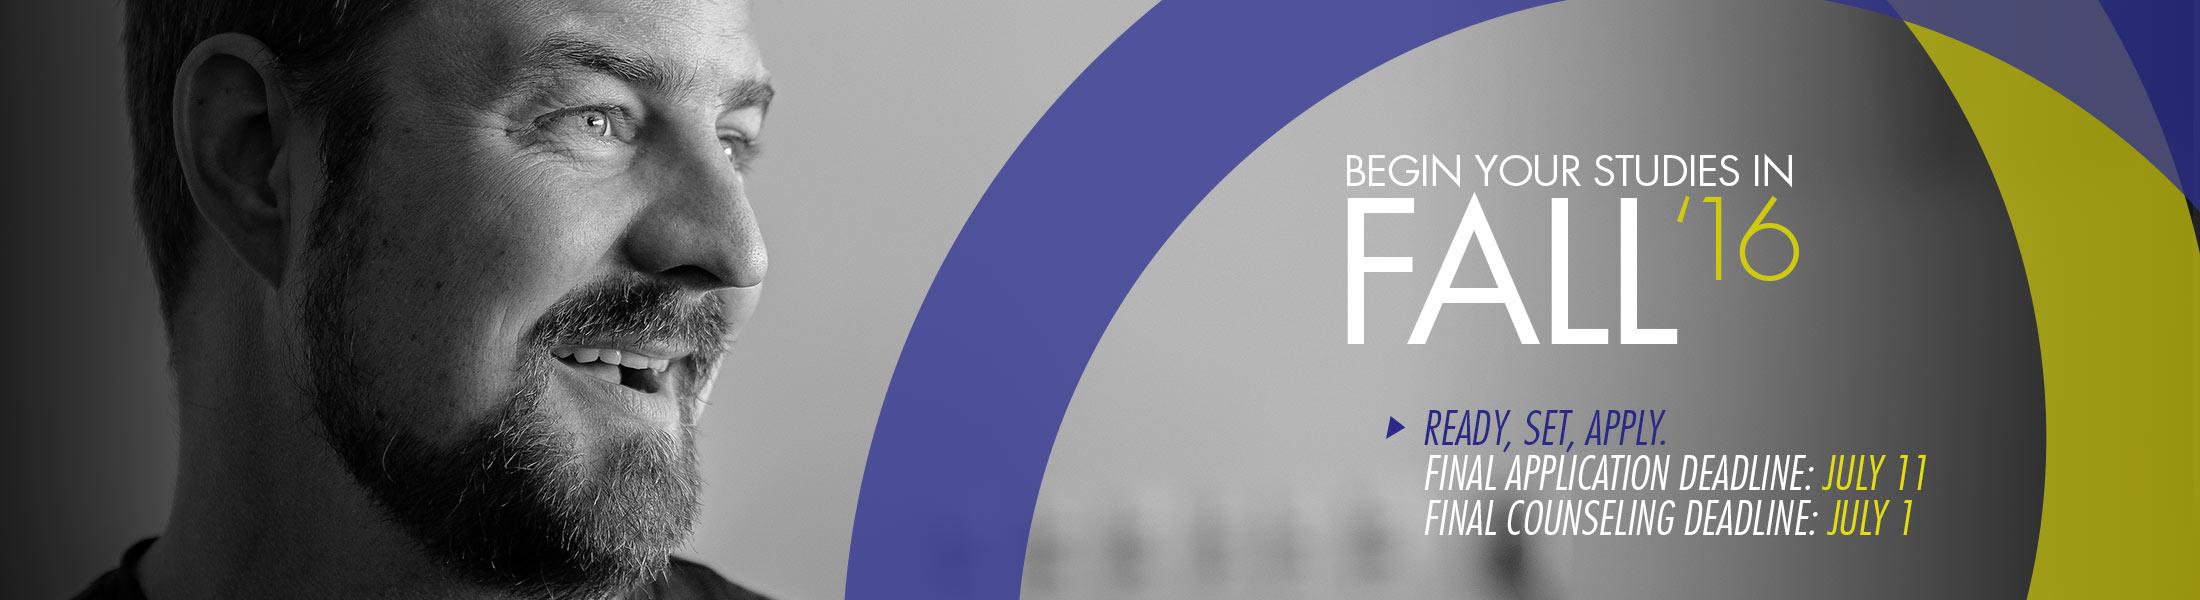 Fall 2016 Final Application Deadline